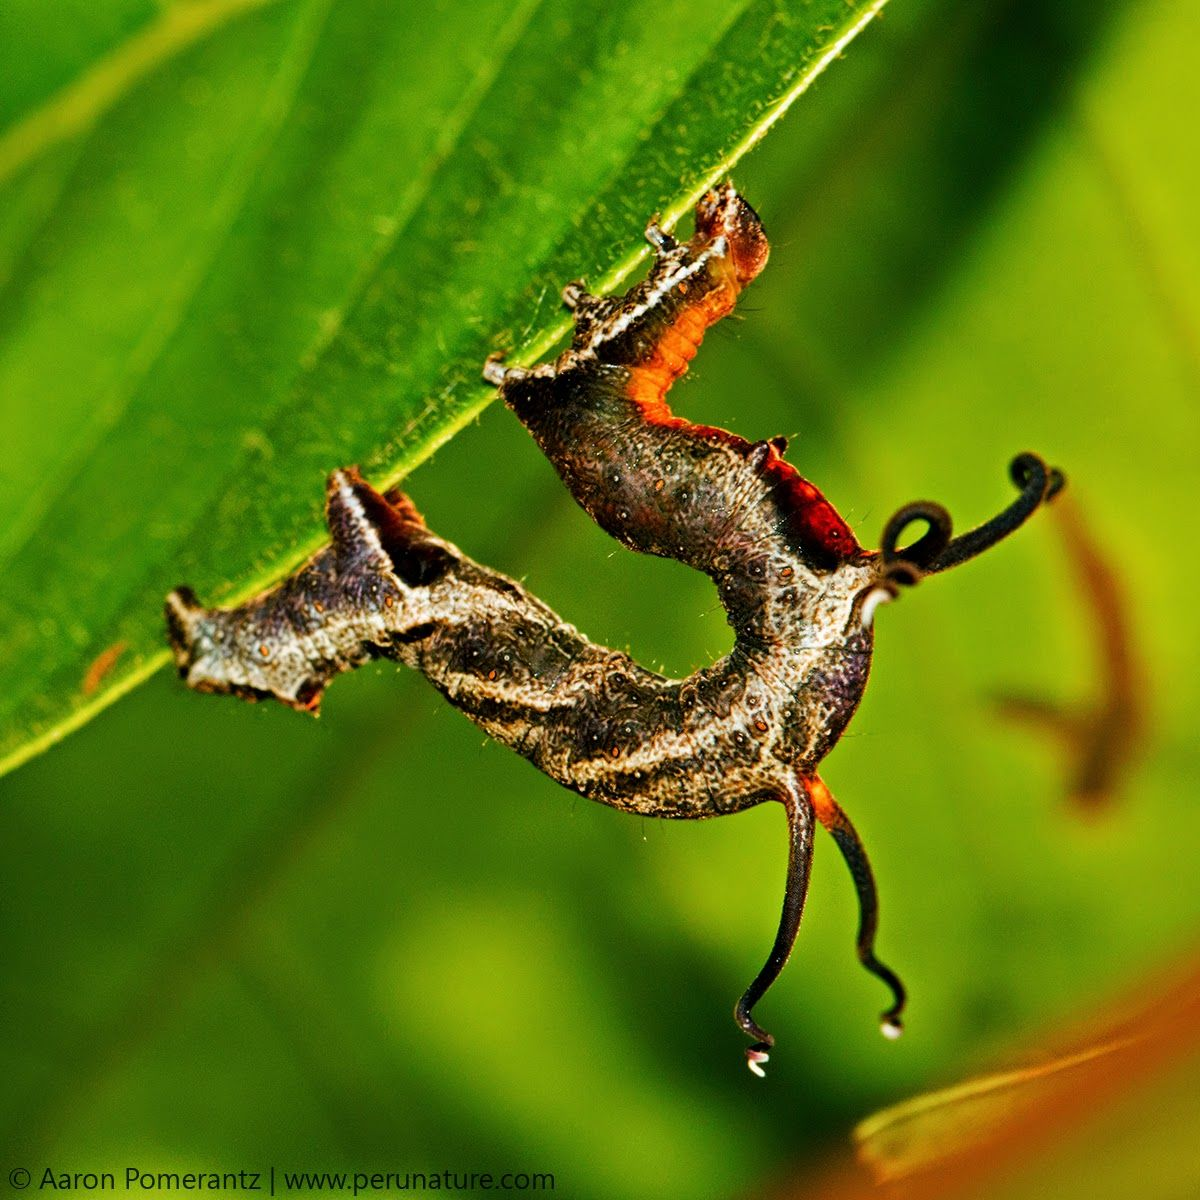 Video: Loud Noises Make This Caterpillar's Tentacles Vibrate